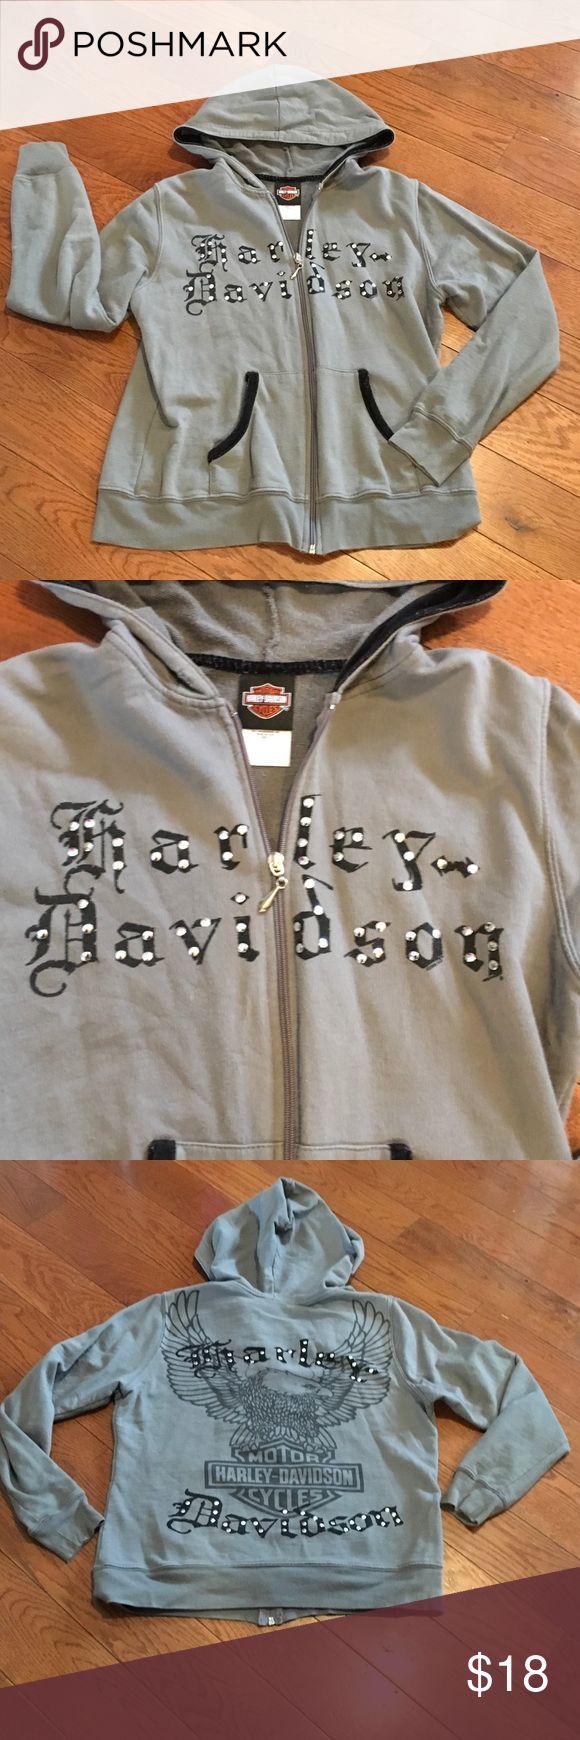 Harley Davidson studded jacket 😎 Harley Davidson jacket- size medium. 100%cotton. Has a hood (string gone) and HD graphics on the back with studs. Harley-Davidson Jackets & Coats Utility Jackets